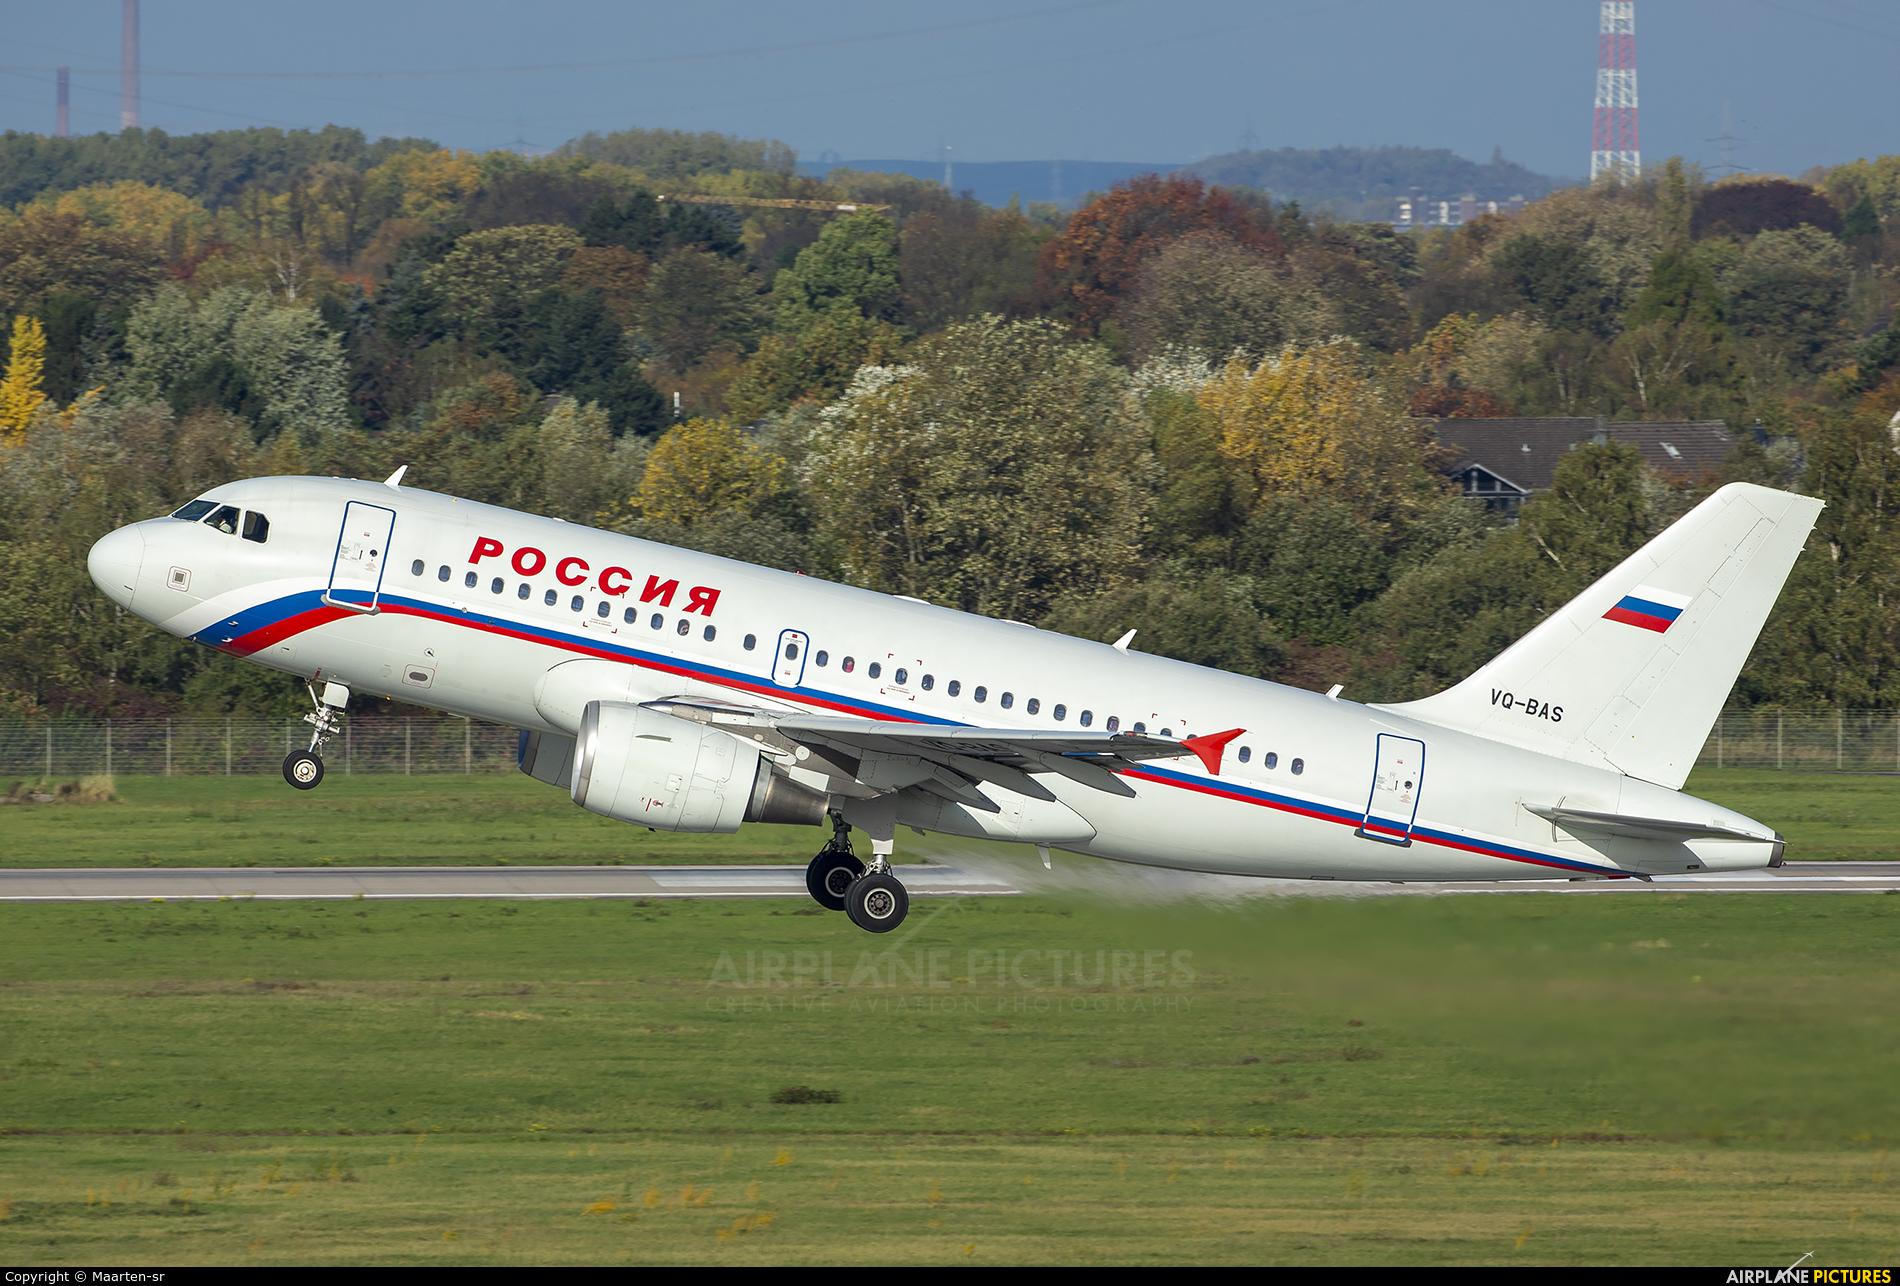 Rossiya VQ-BAS aircraft at Düsseldorf